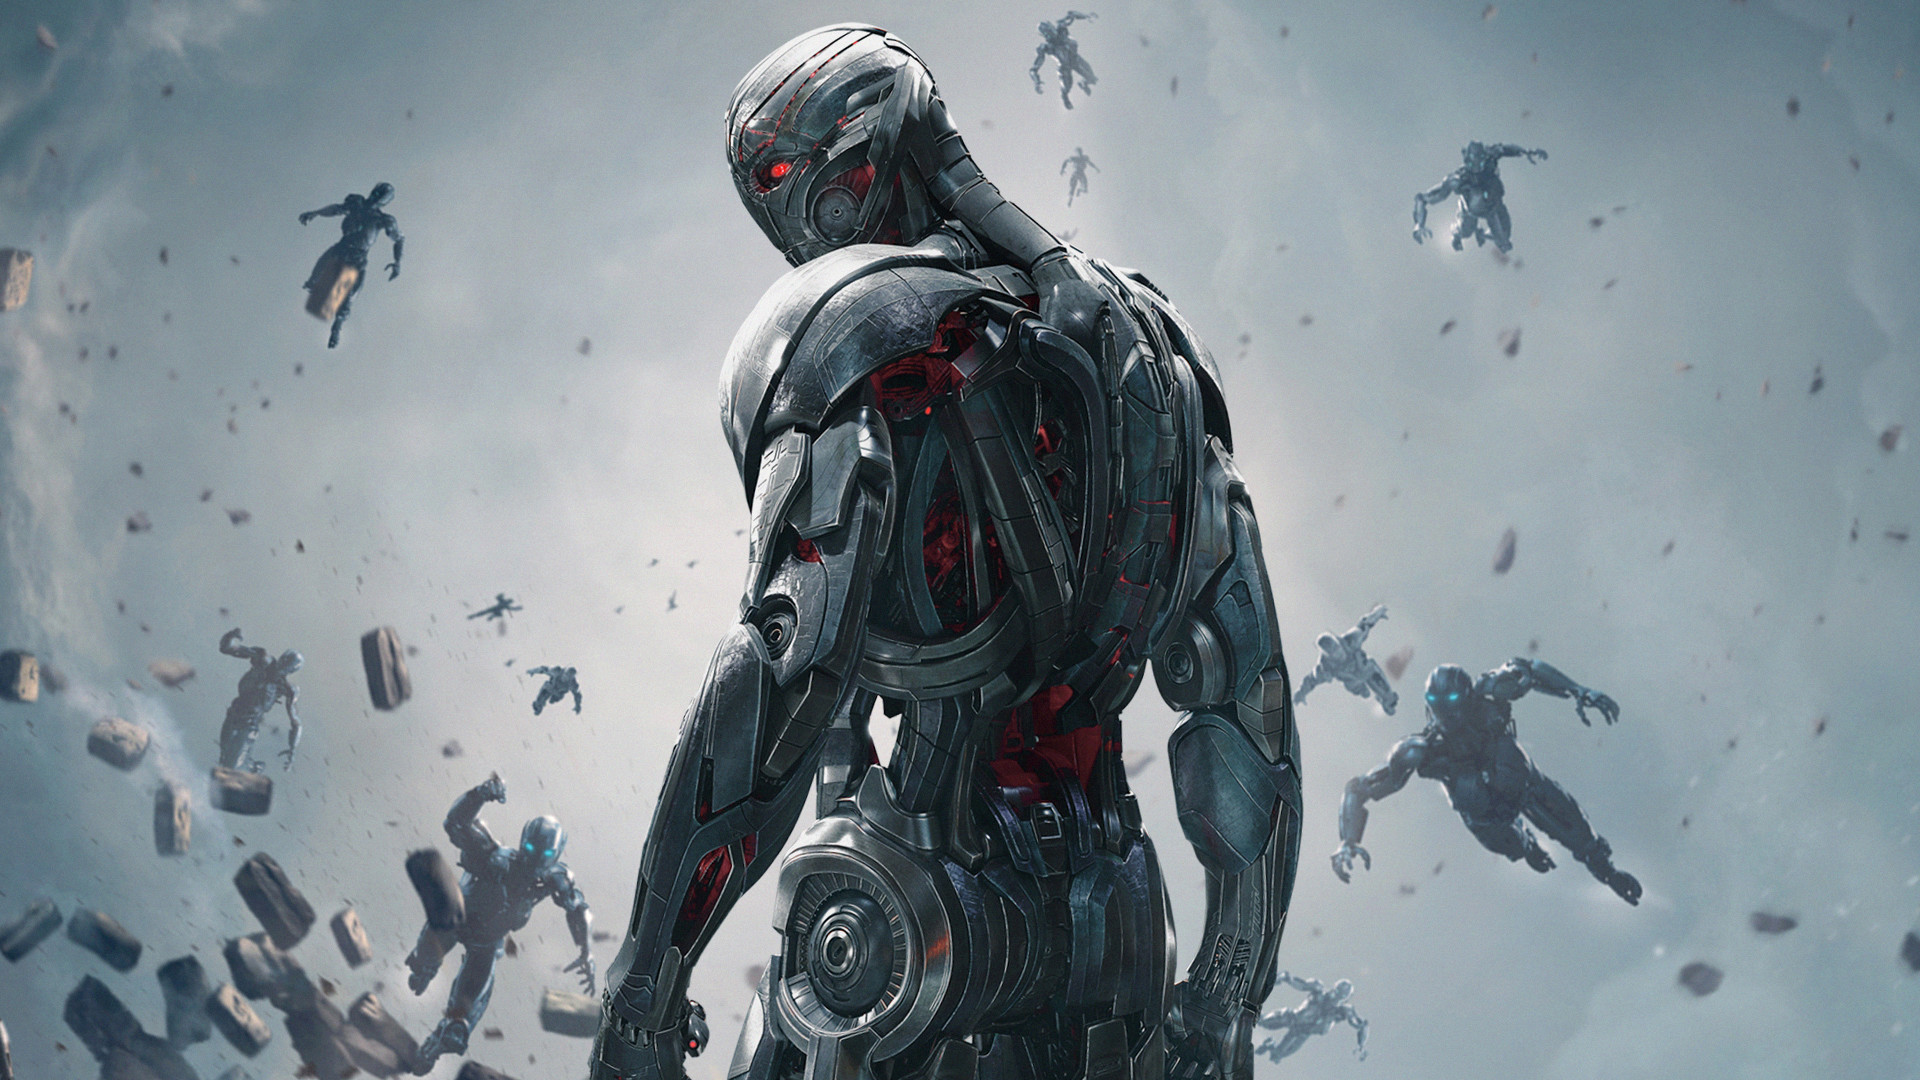 Avengers Age Of Ultron Wallpaper High Resolution